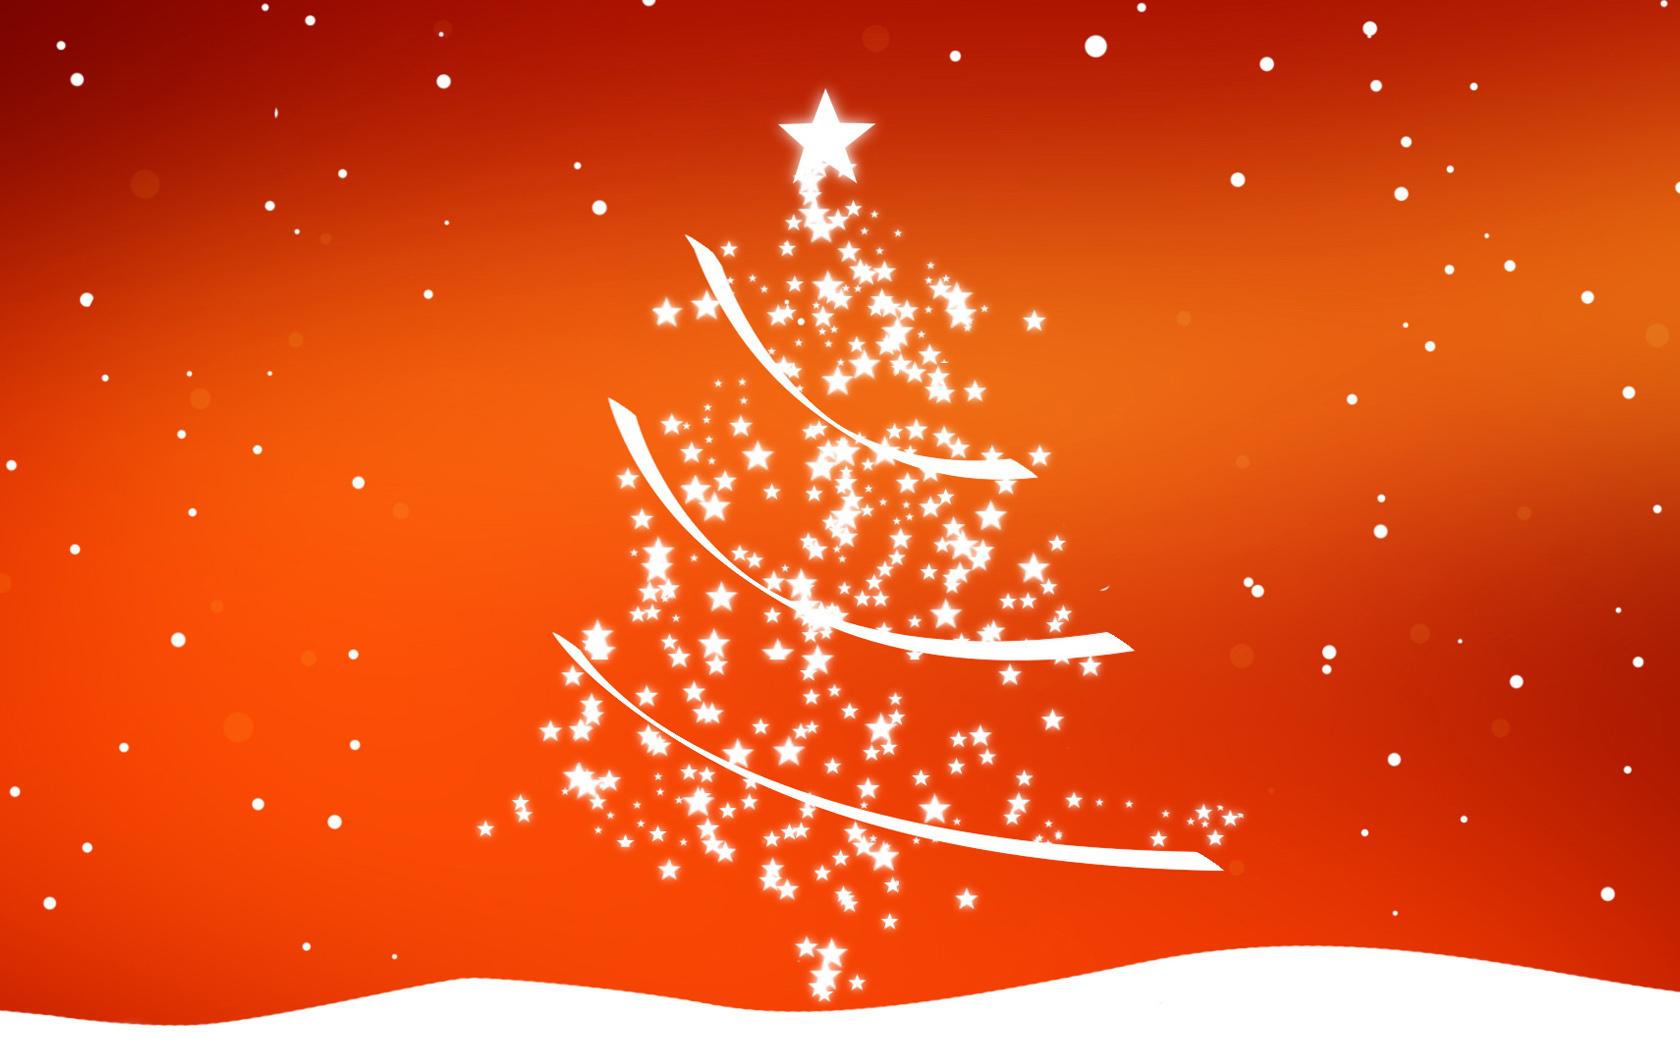 Christmas Theme Wallpaper - WallpaperSafari